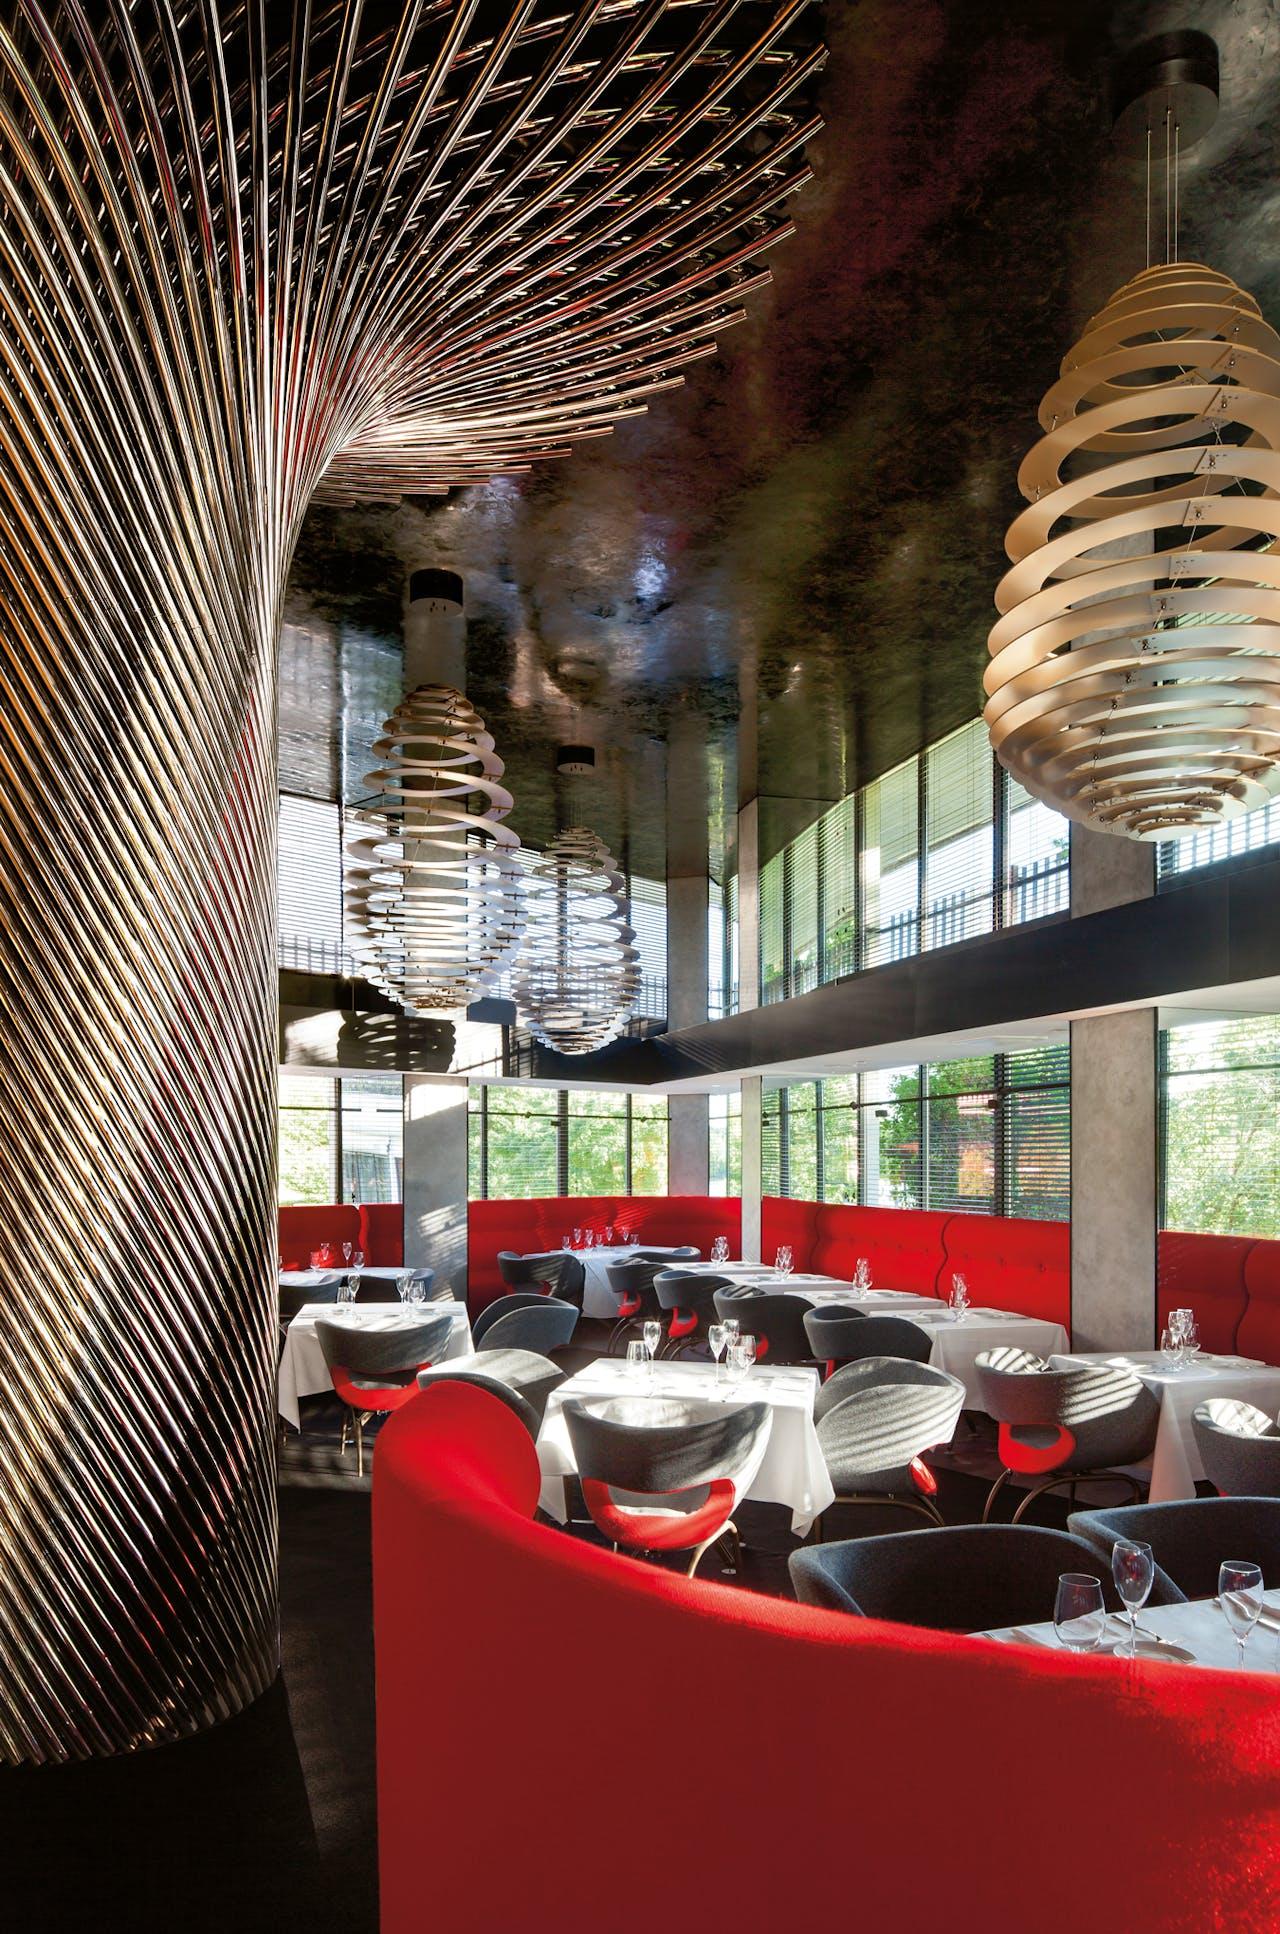 Restaurant Kingbird in The Watergate Hotel.